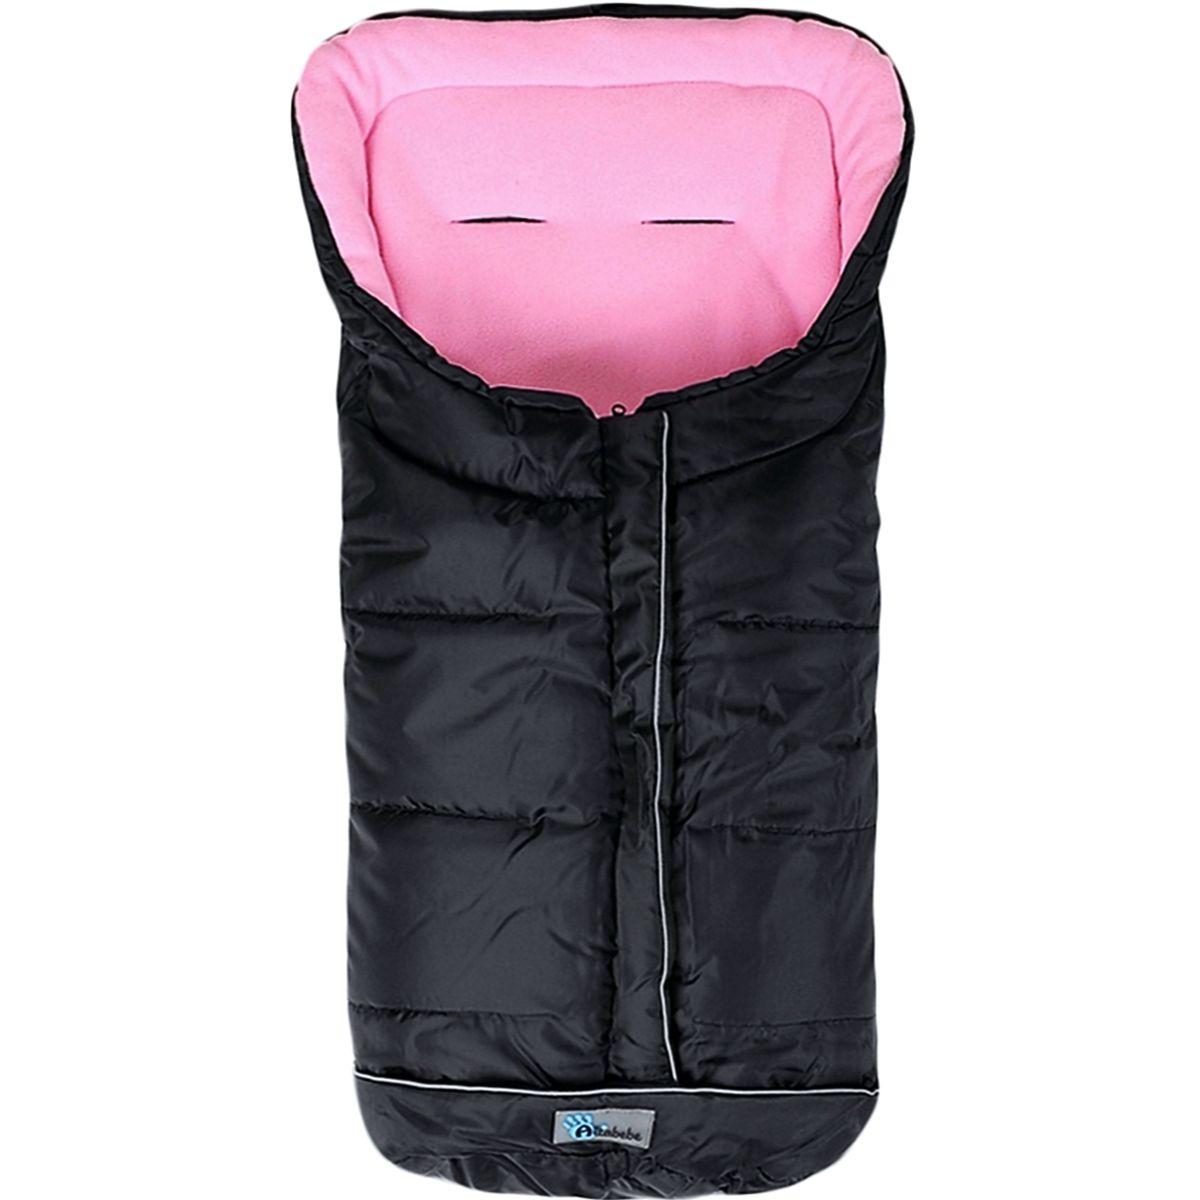 altabebe winterfu sack fu sack kinderfu sack f r kinderwagen kind jogger buggy ebay. Black Bedroom Furniture Sets. Home Design Ideas